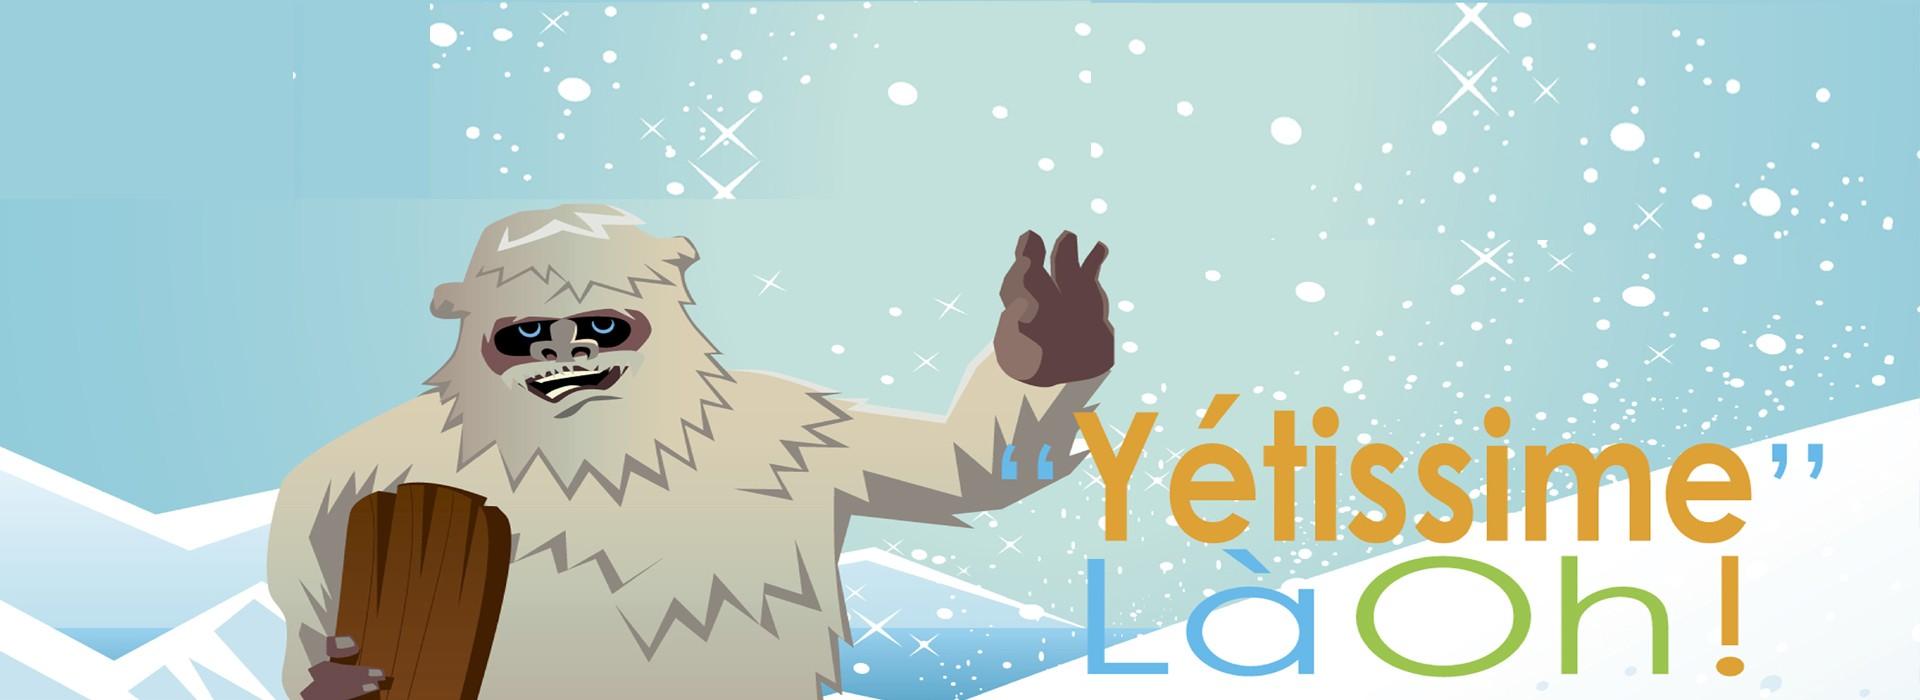 manifestations-hiver-2019 Mag LàOh!